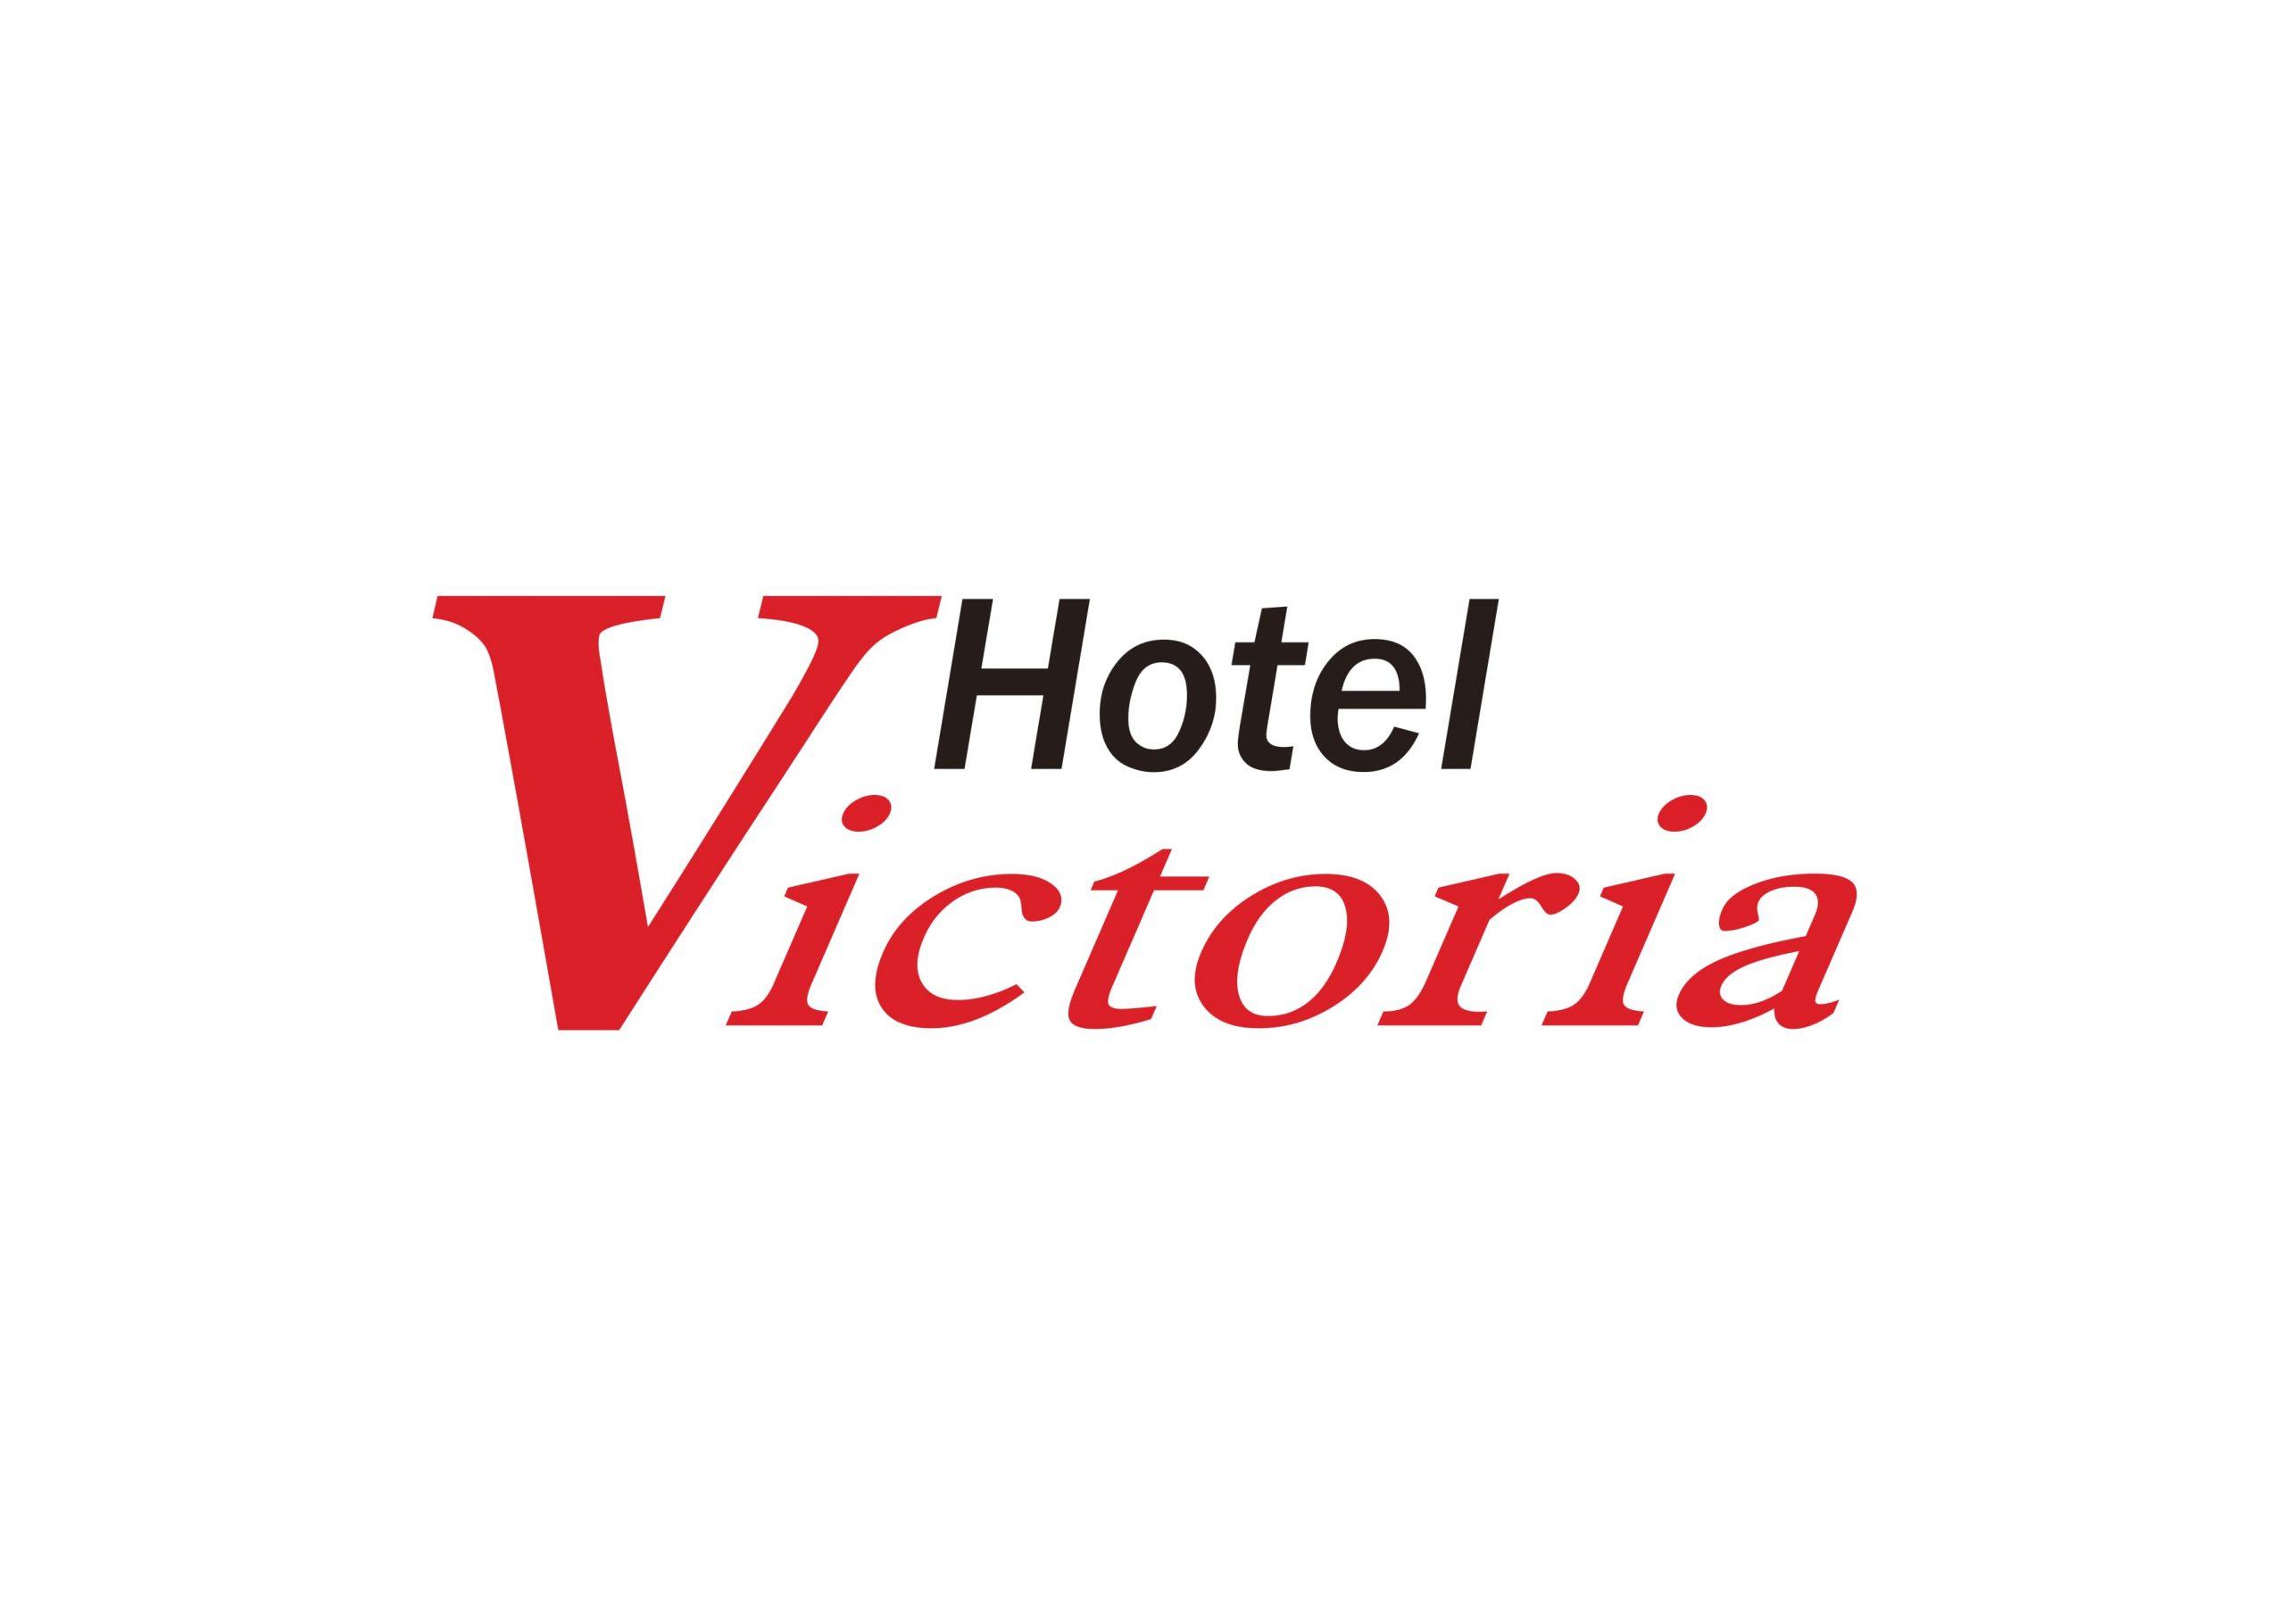 Infolinia Hotel Victoria   Numer, telefon, numer, adres, informacje dodatkowe